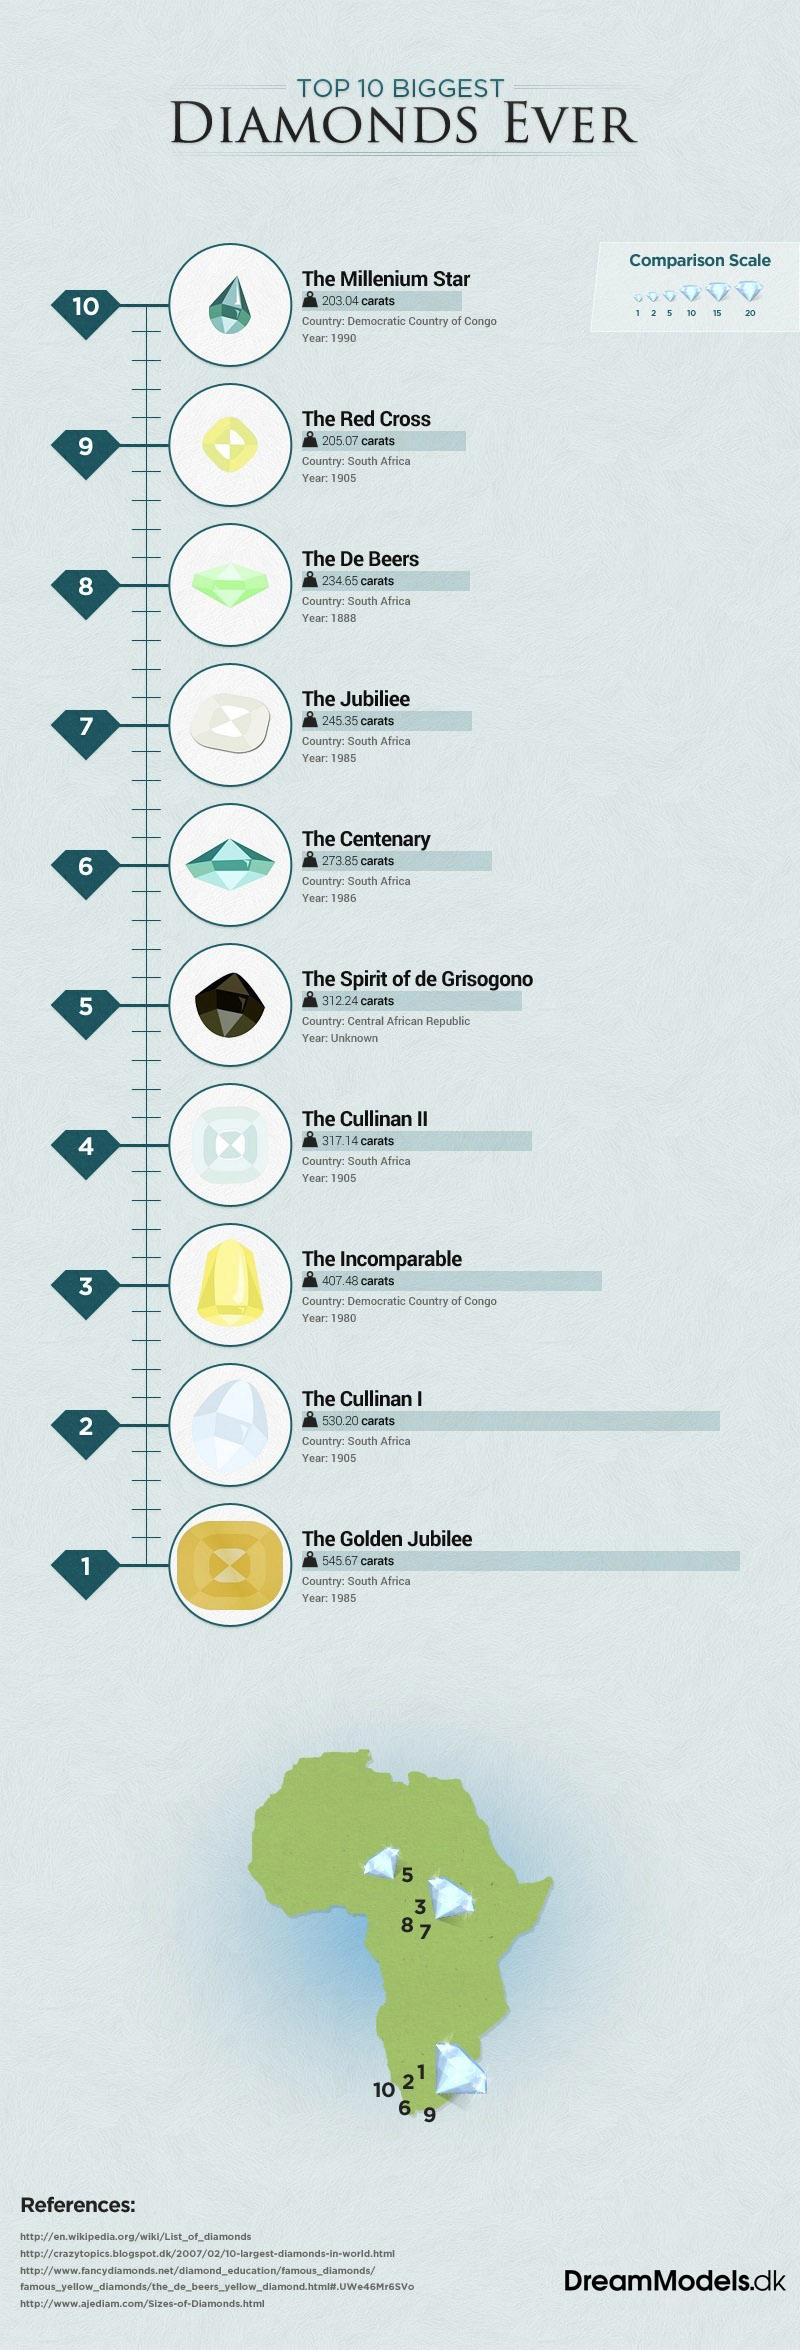 Top 10 biggest diamonds in the world. Credit: Mads Phikamphon.